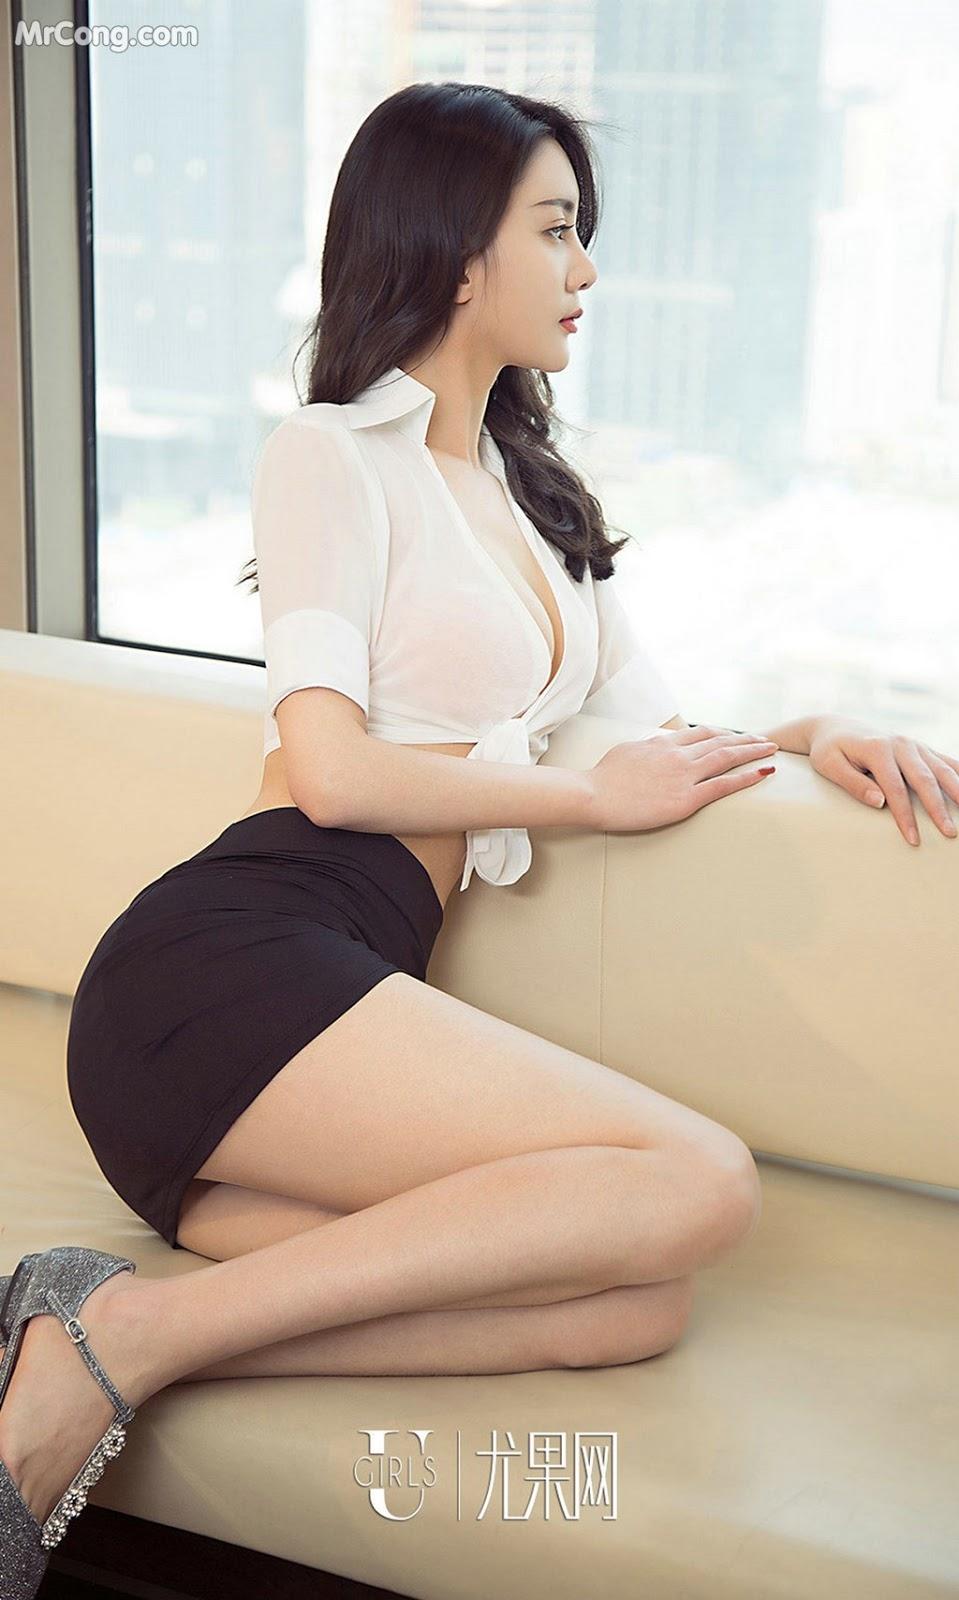 Image UGIRLS-Ai-You-Wu-App-No.1389-Lucy-MrCong.com-007 in post UGIRLS – Ai You Wu App No.1389: Người mẫu Lucy (35 ảnh)